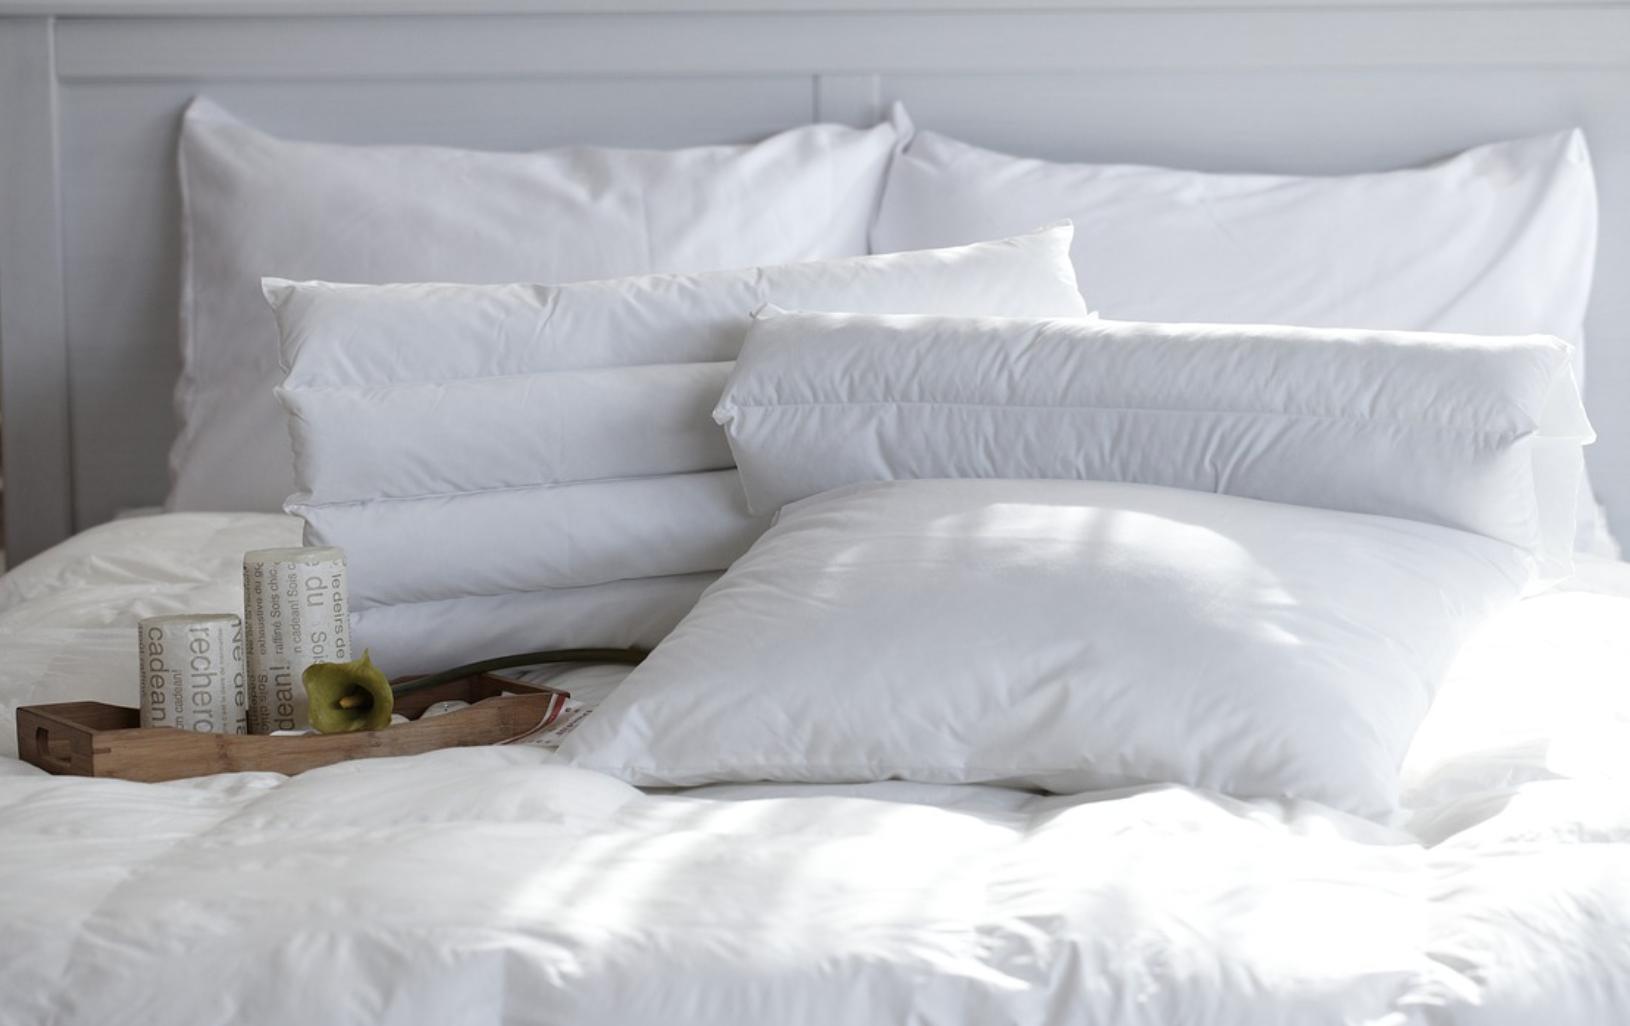 bedding and linen pixabay